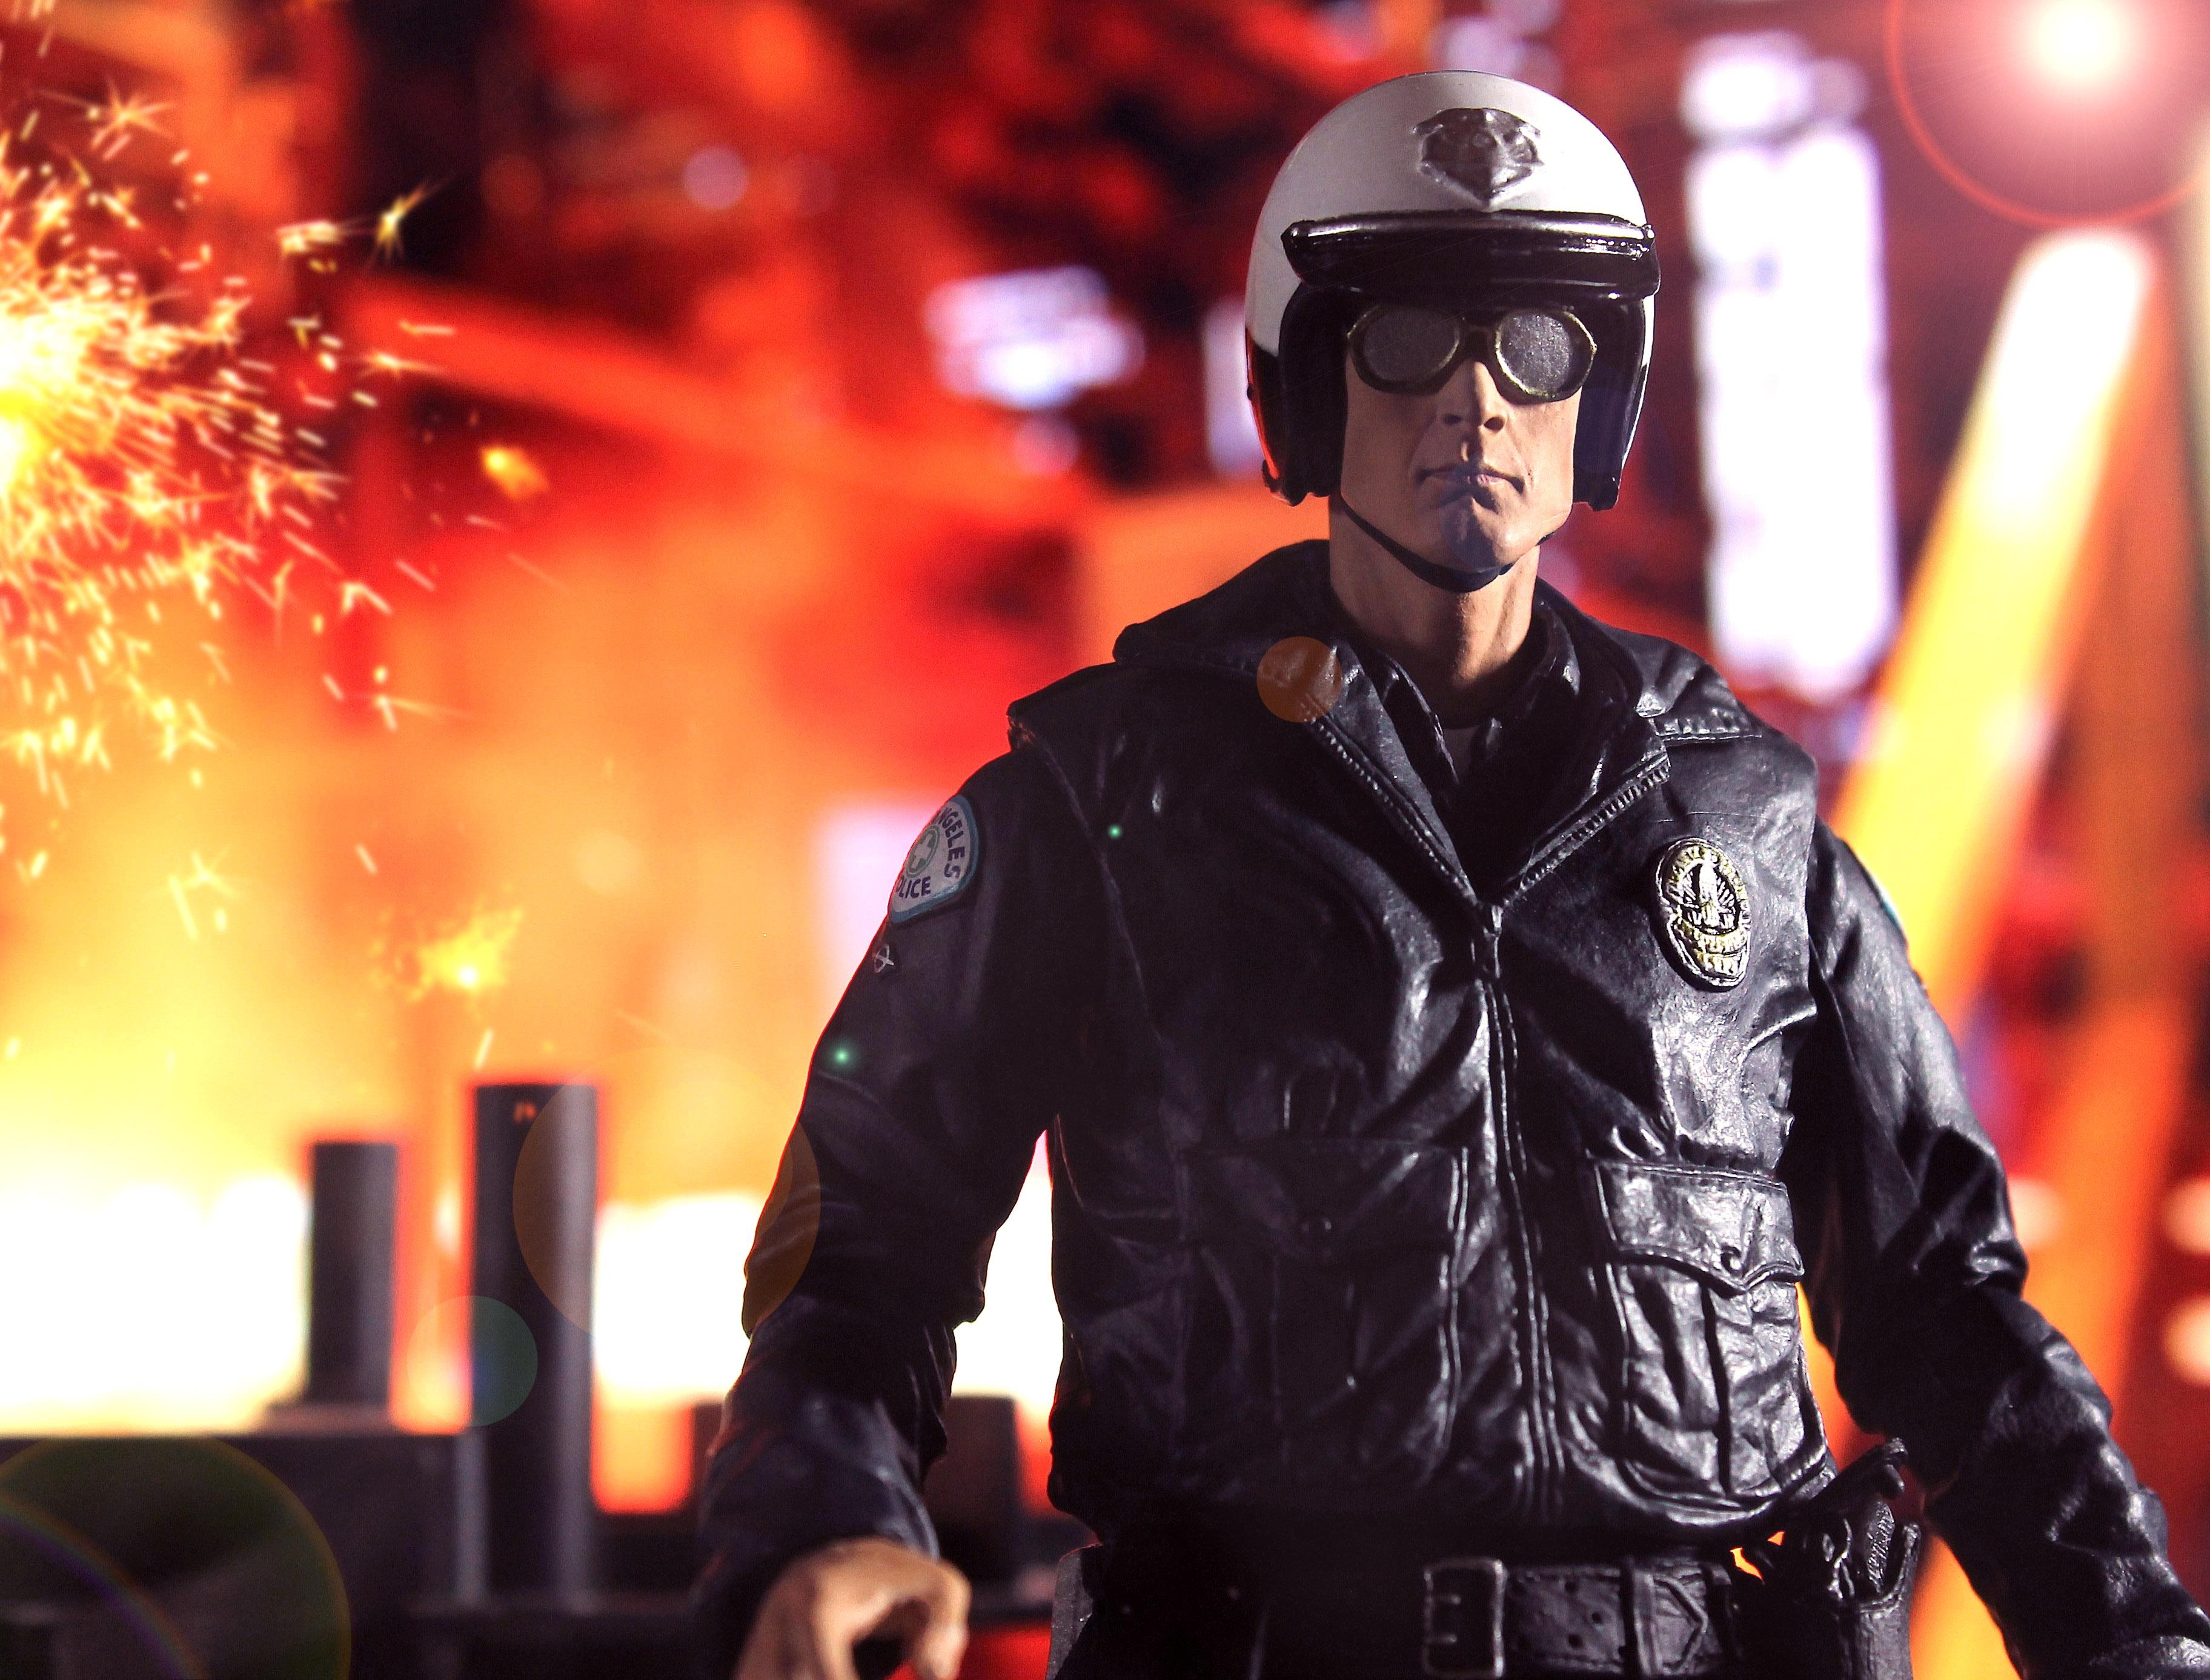 Wallpaper t1000 neca motorcycle cop terminator terminator2 judgmentday robertpatrick - Terminator 2 wallpaper hd ...